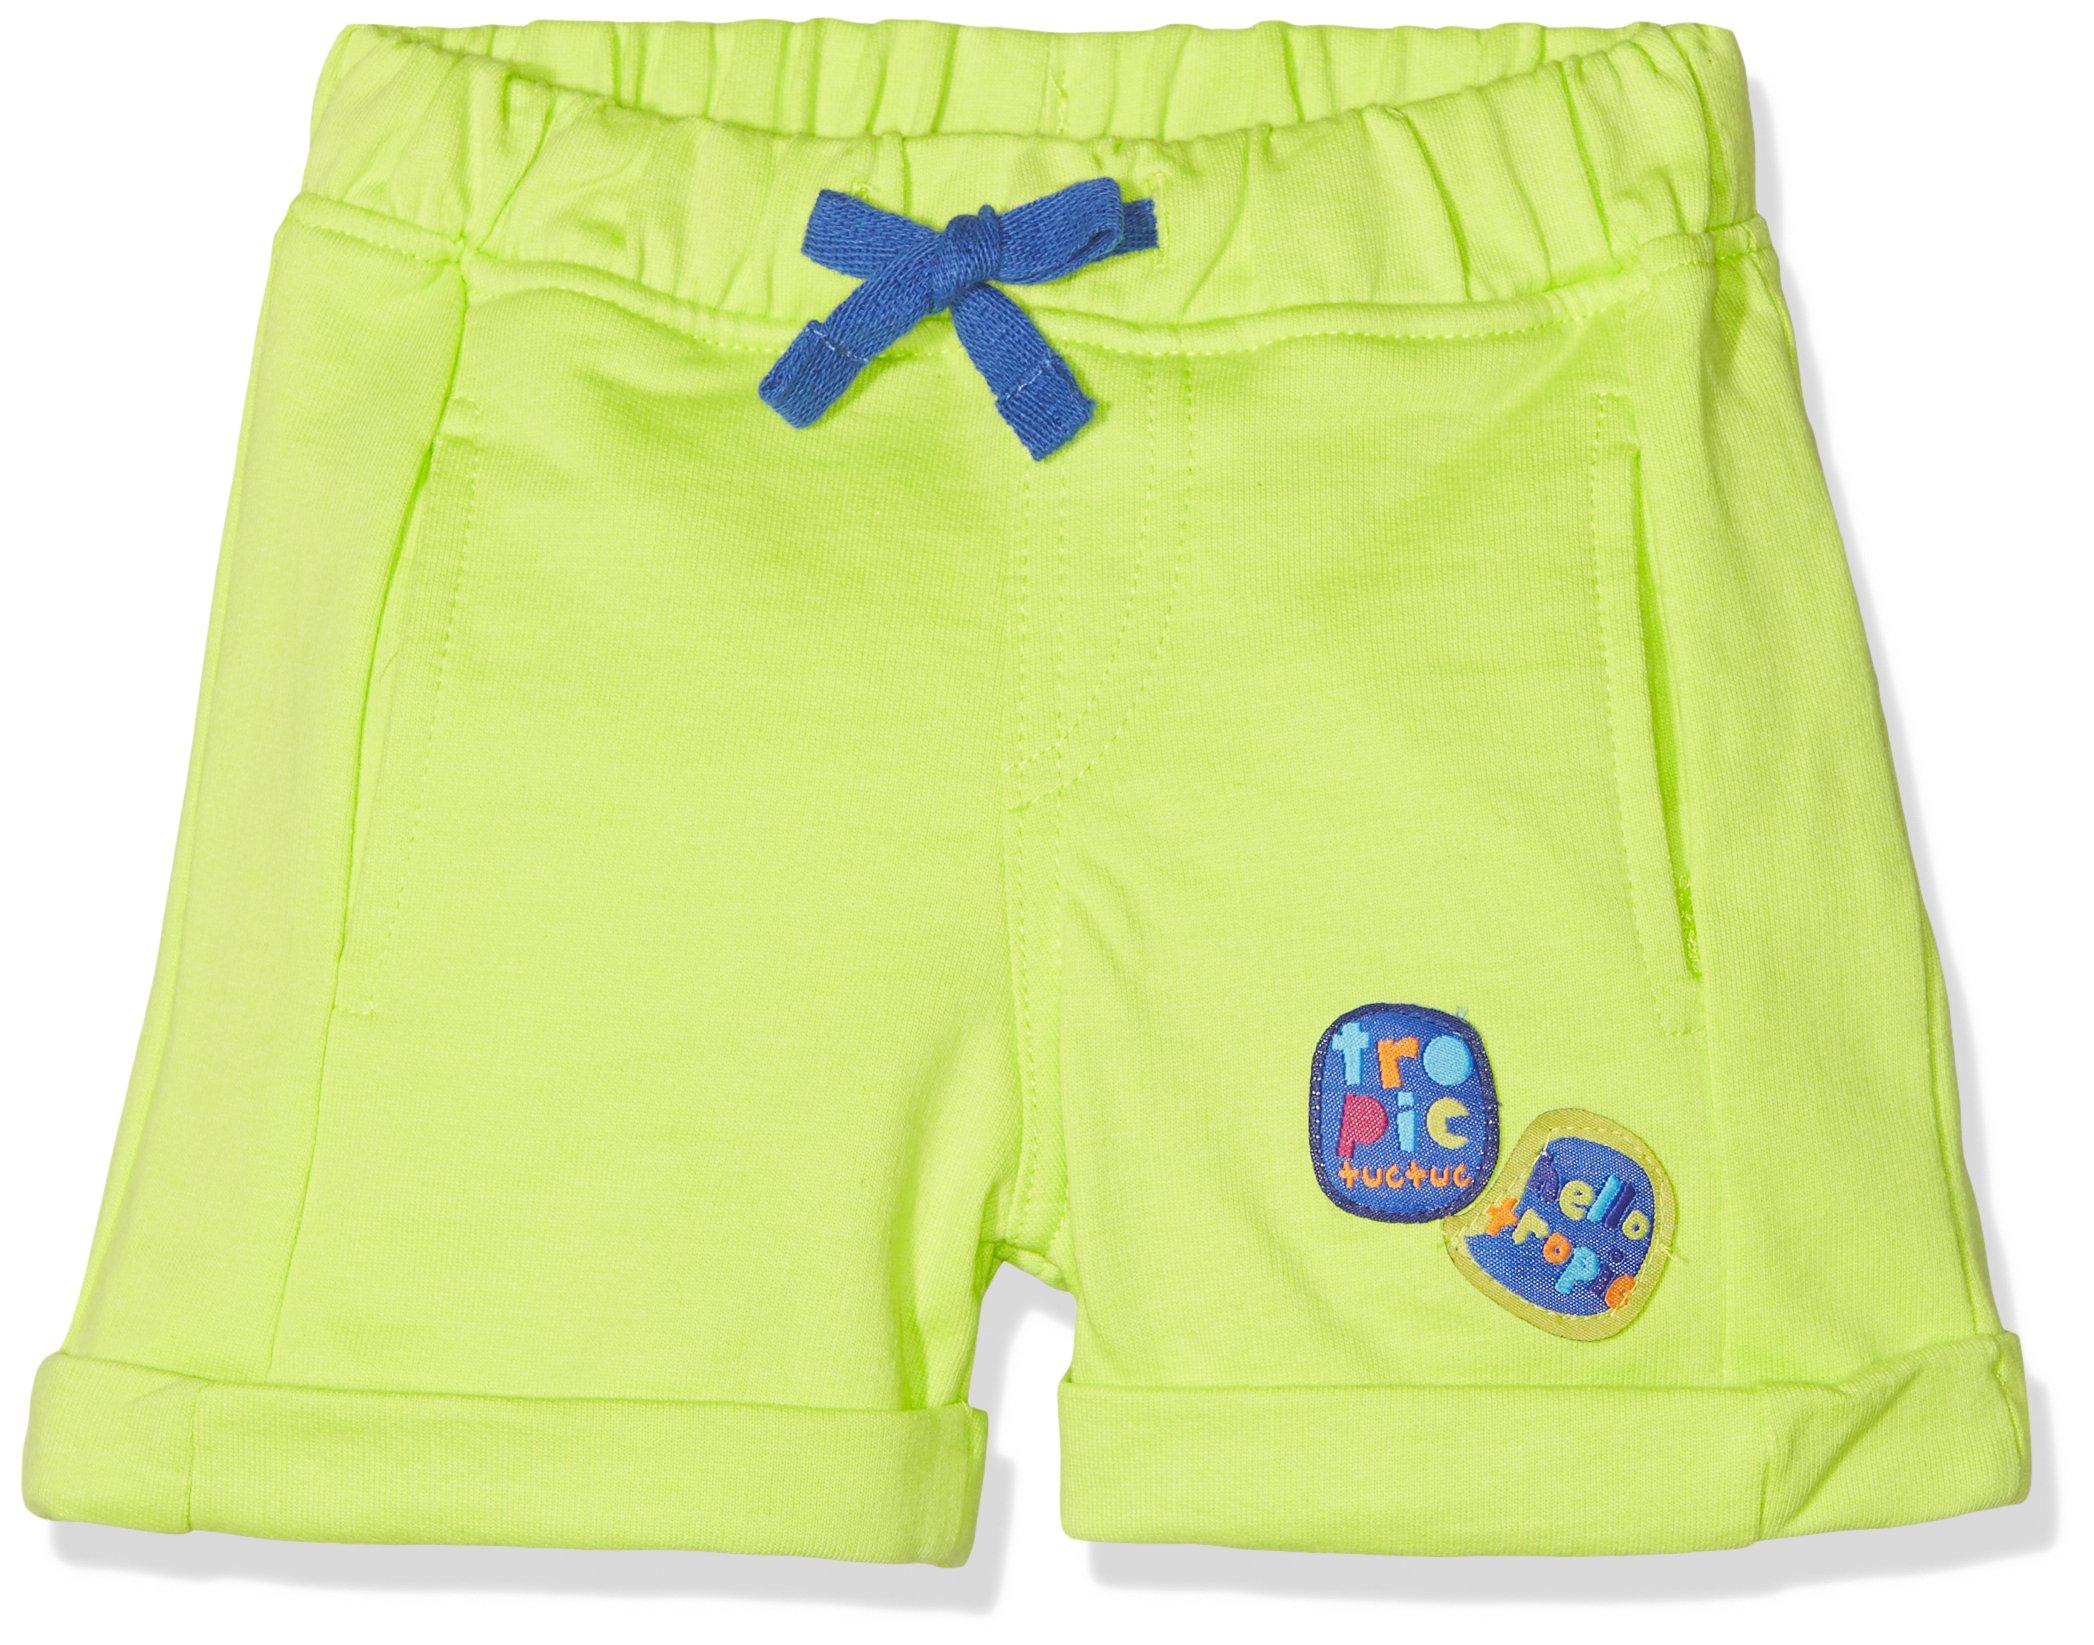 Tuc Tuc Pantalones para Bebés 4